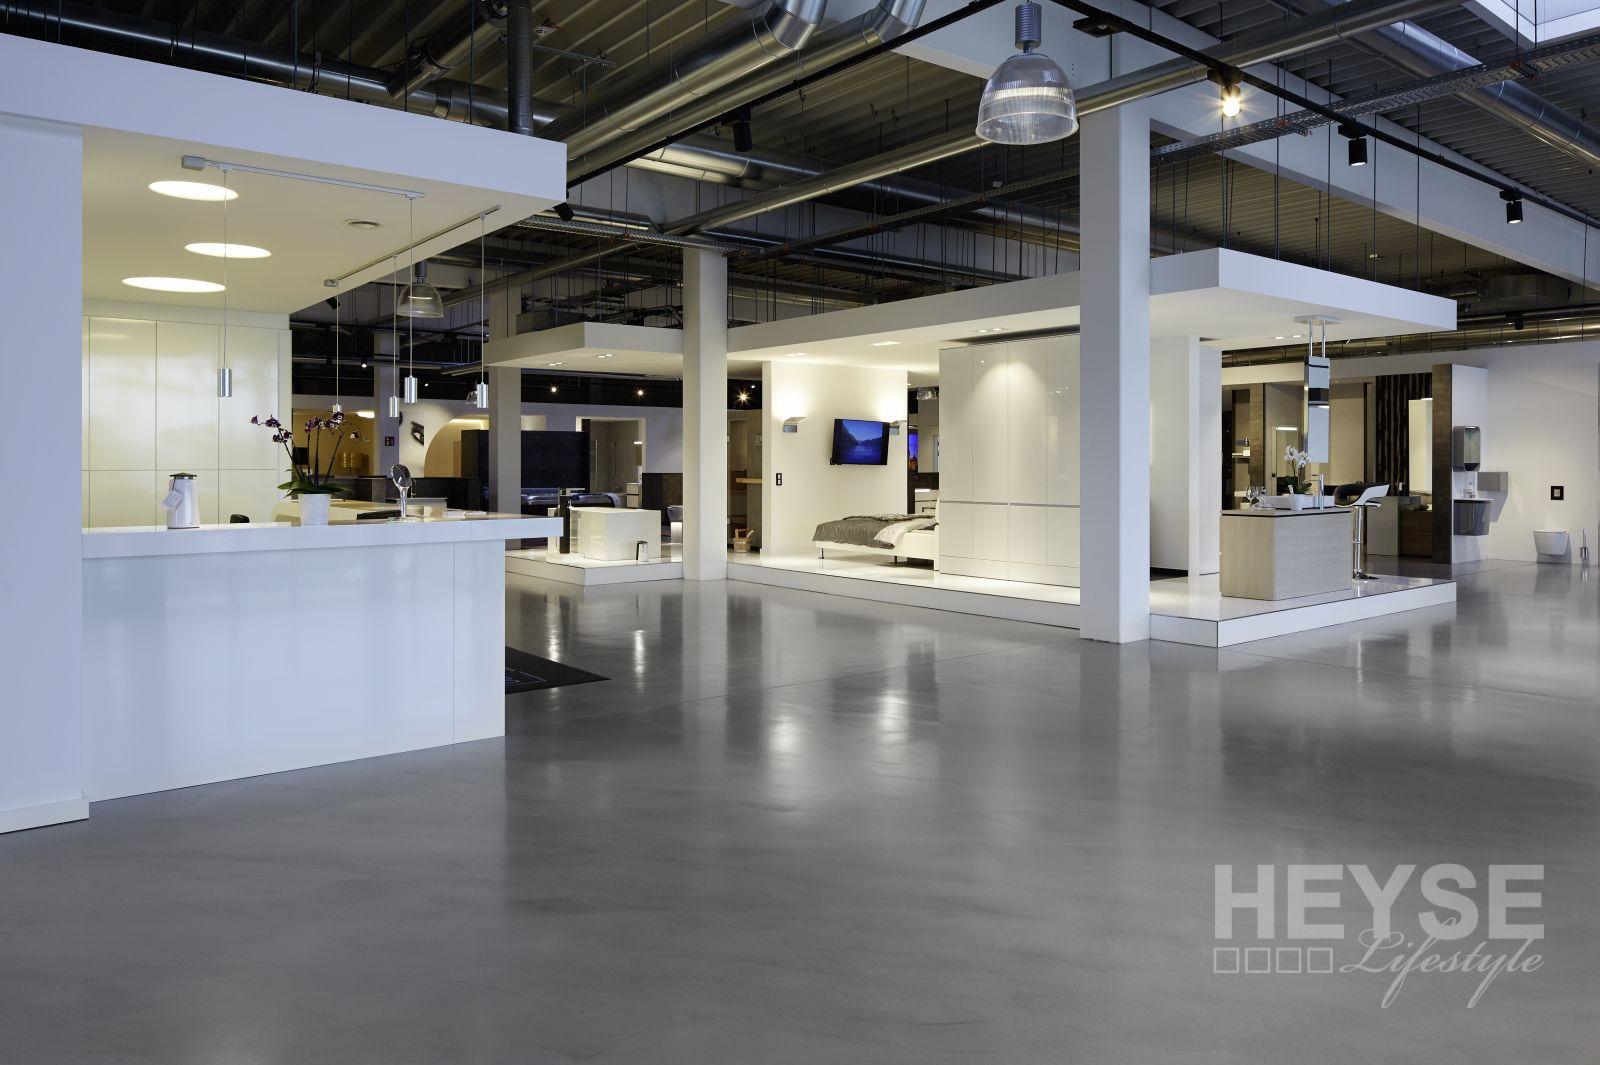 Boden Betonoptik fugenloser boden, designboden, spachtelboden betonoptik | meinmaler